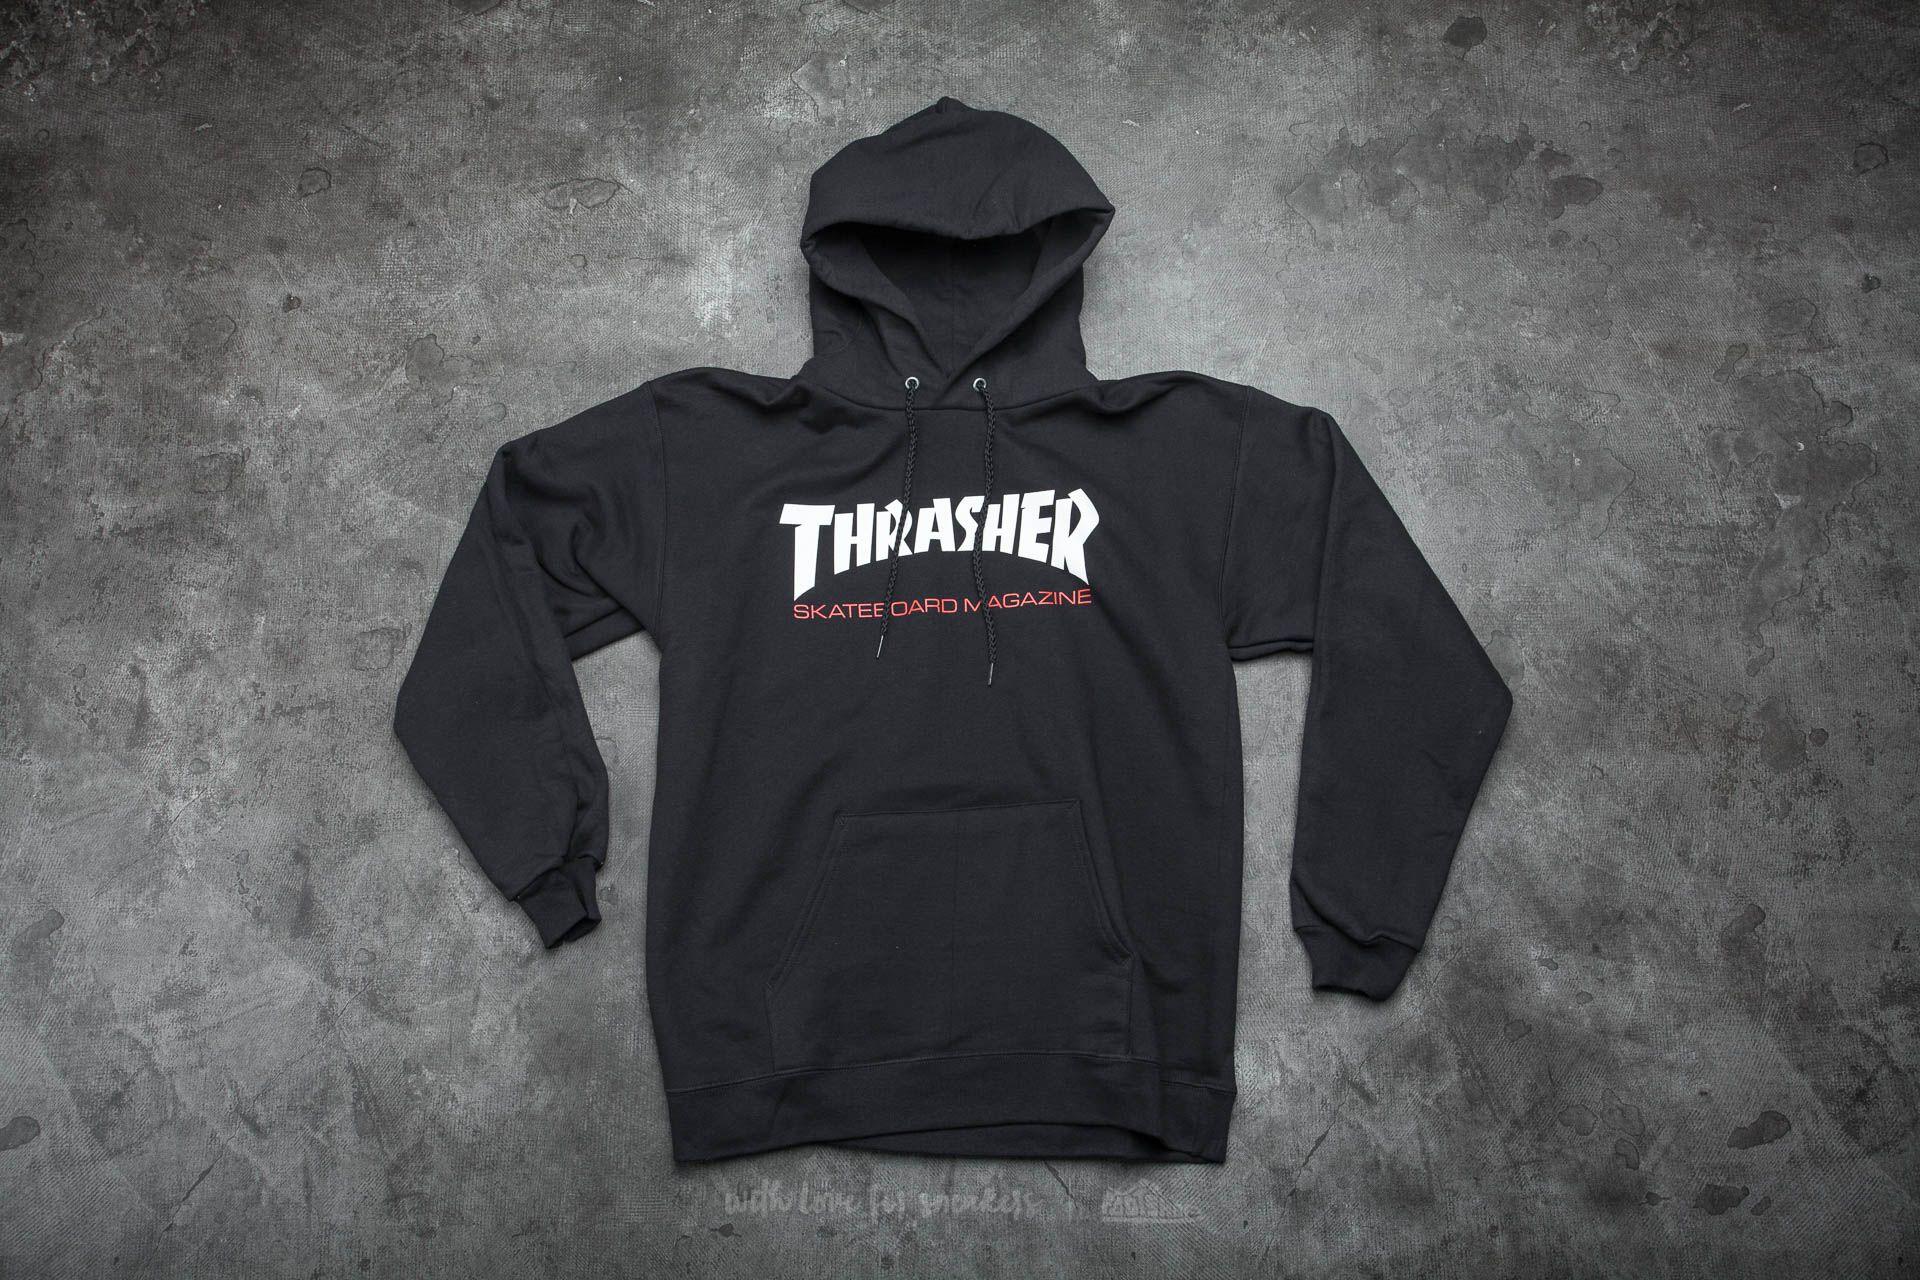 Thrasher Two-Tone Skate Mag Hoodie Black